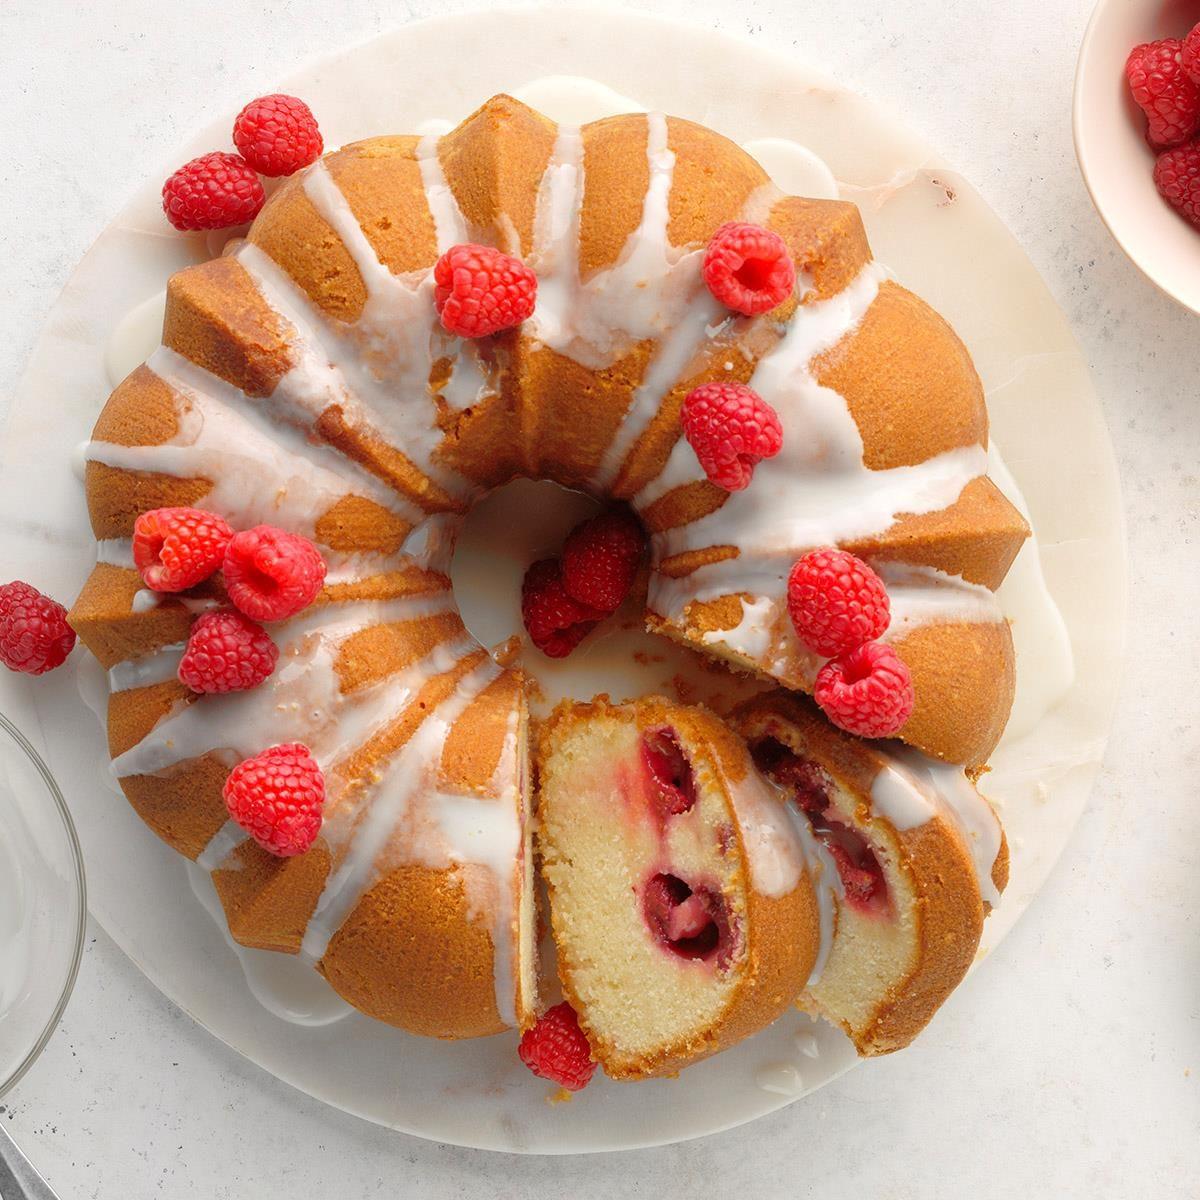 25 Fabulous Fruit-Forward Bundt Cakes